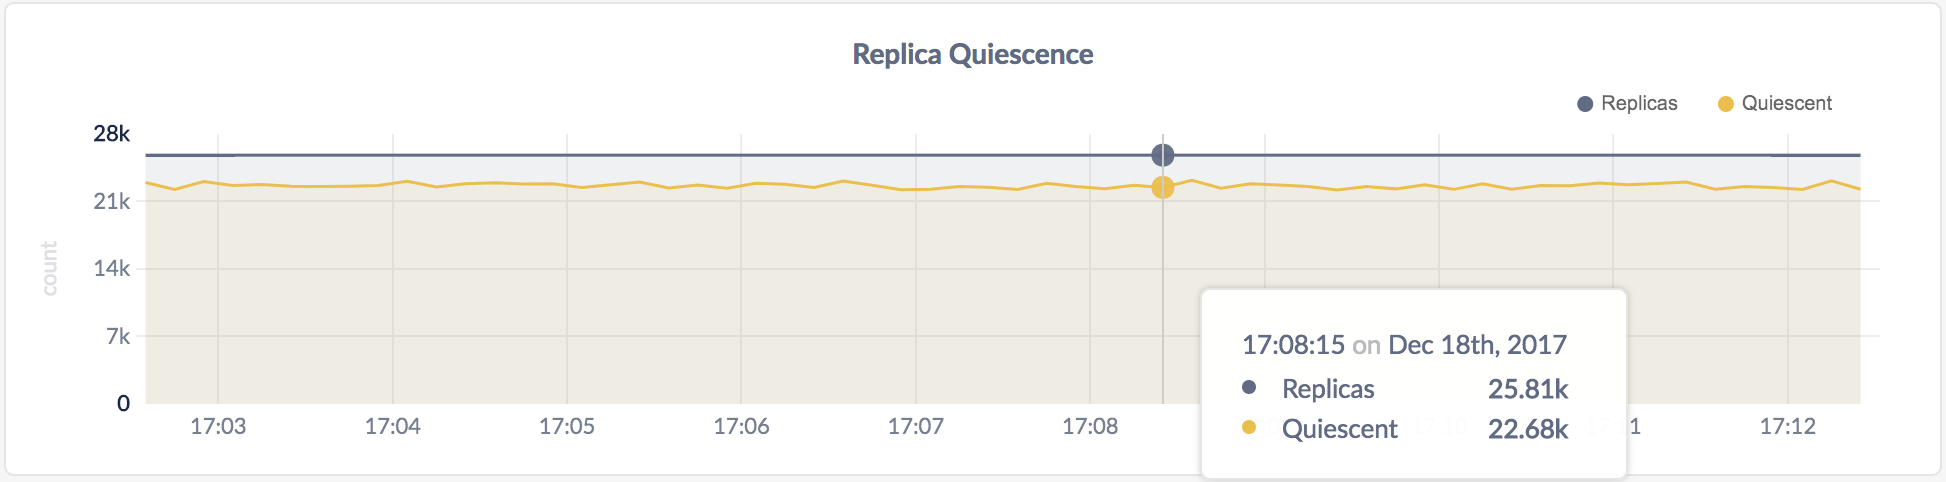 CockroachDB Admin UI Replica Quiescence